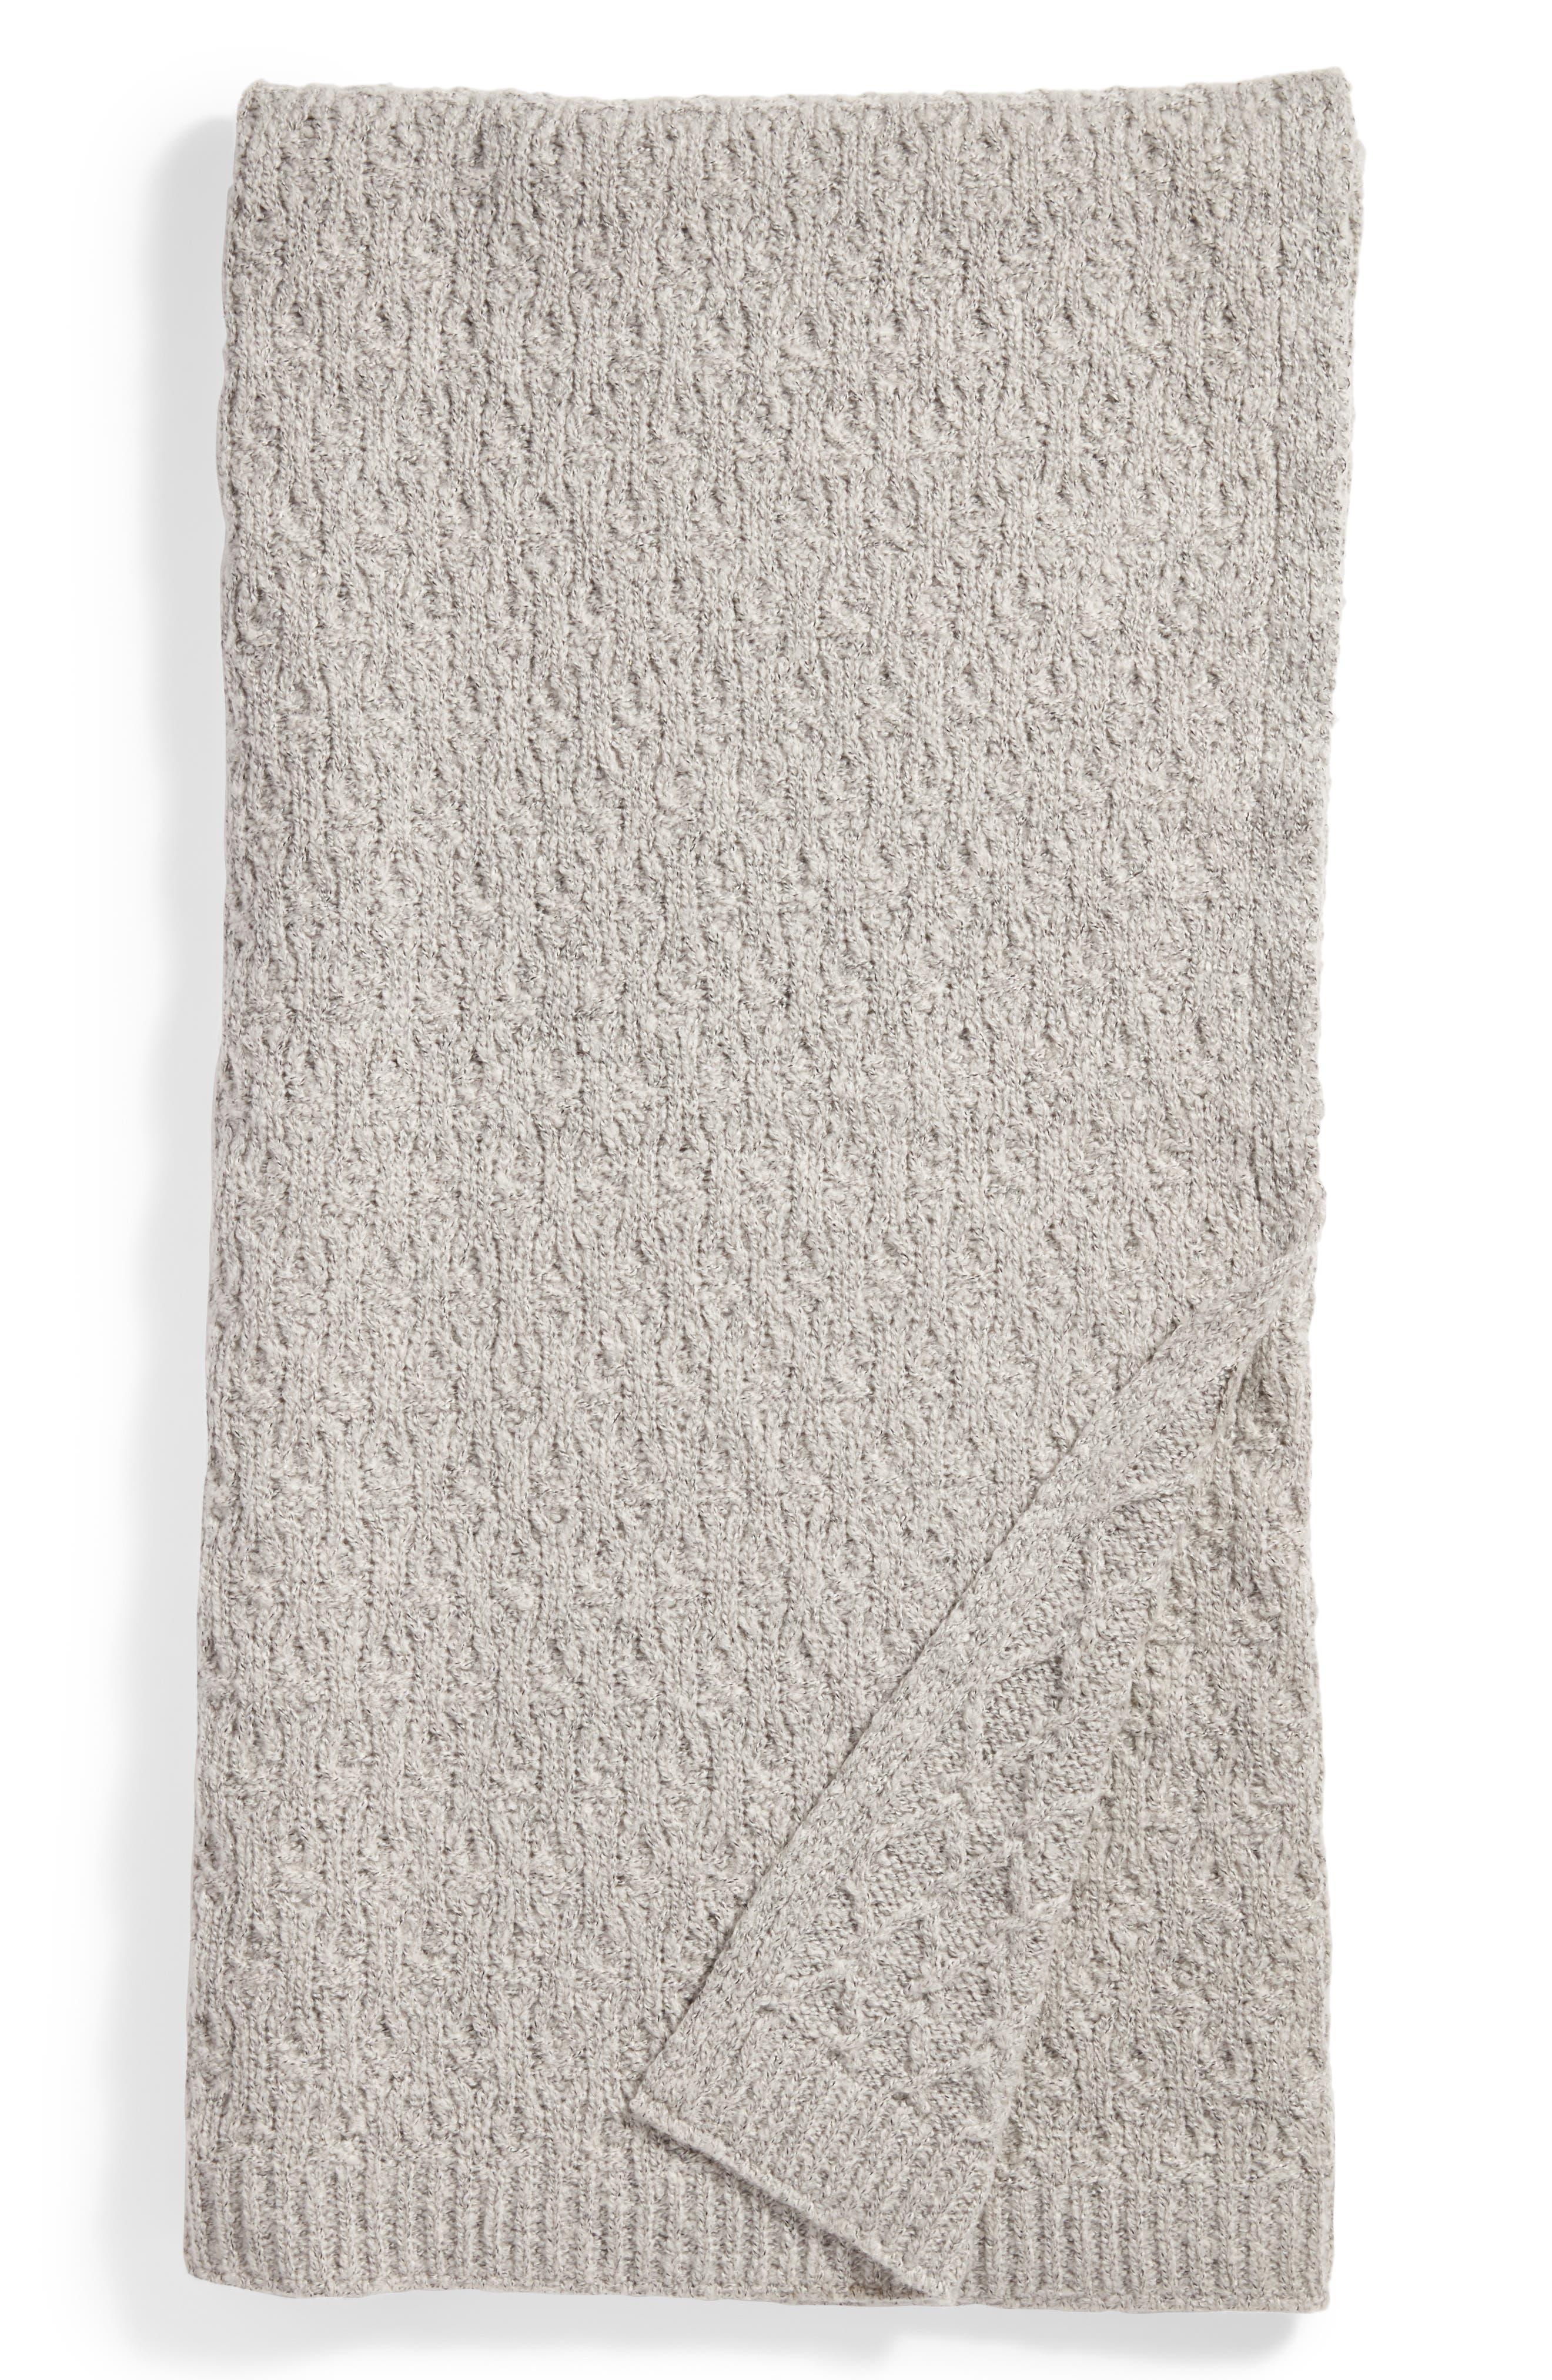 Diamond Knit Throw,                             Main thumbnail 1, color,                             020